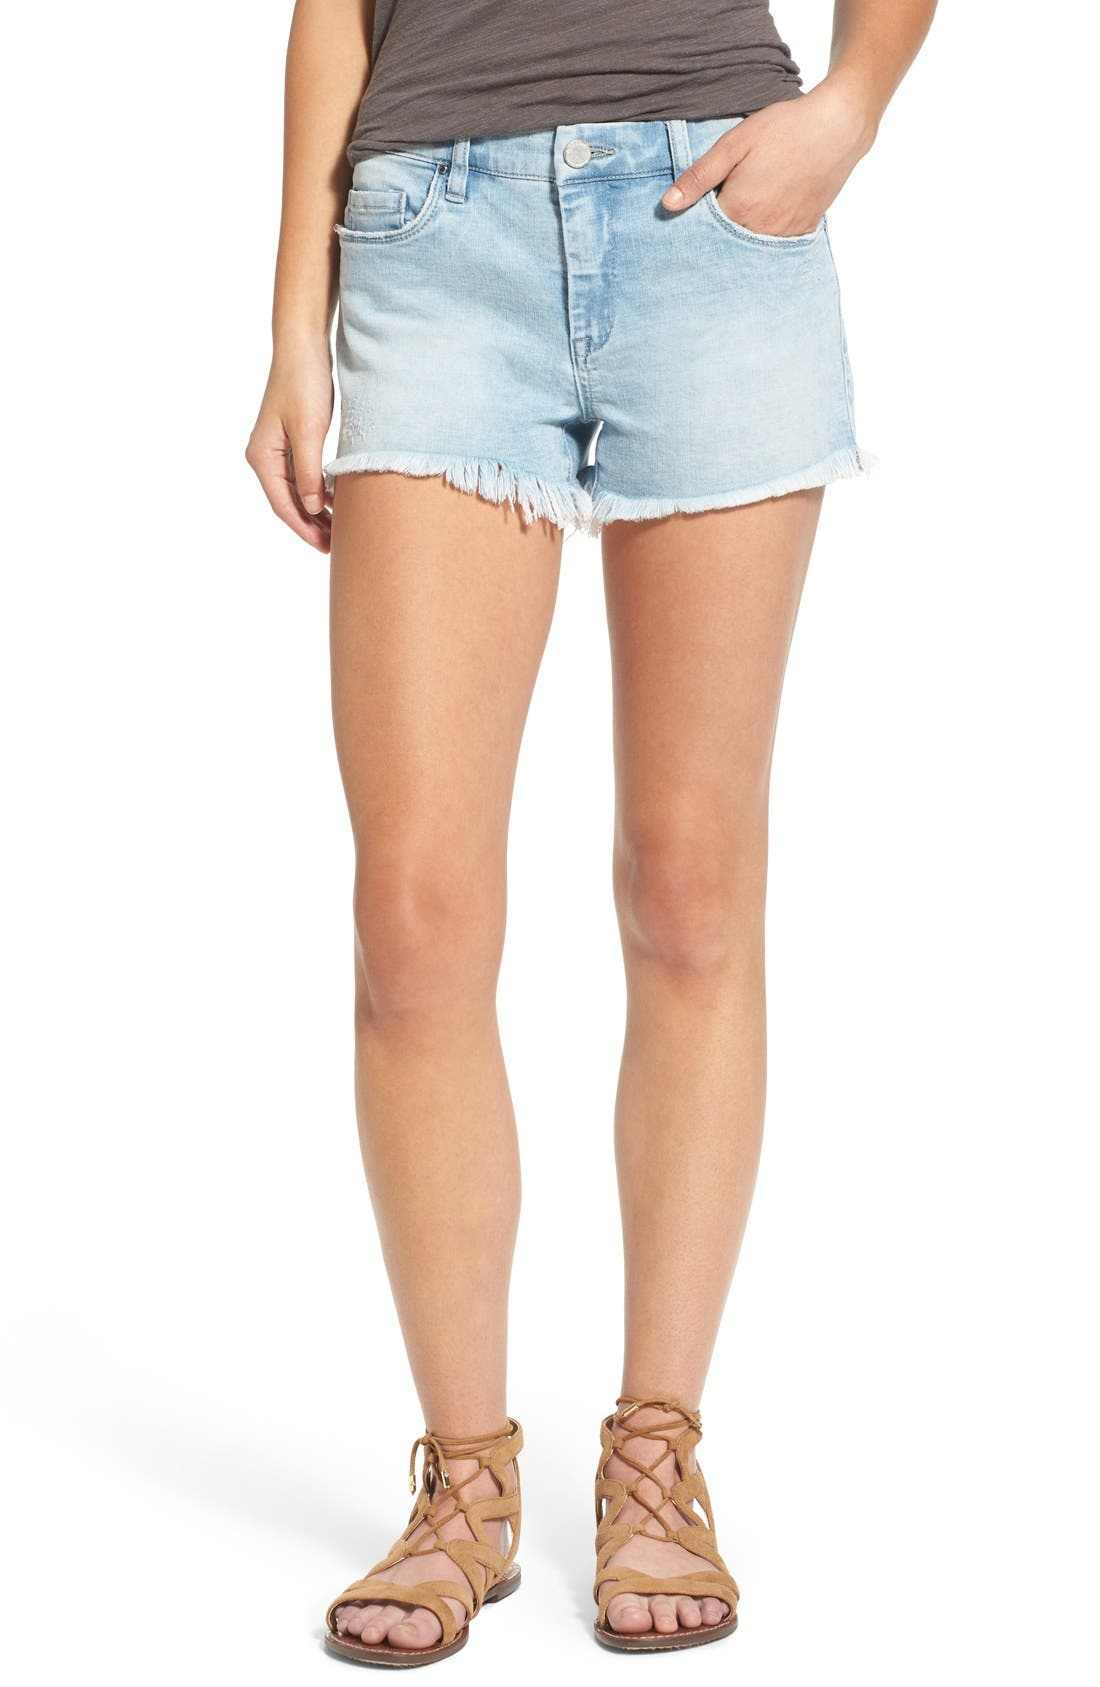 Alternate Image 1 Selected - BLANKNYC 'Emoji Fatigue' Denim Cutoff Shorts